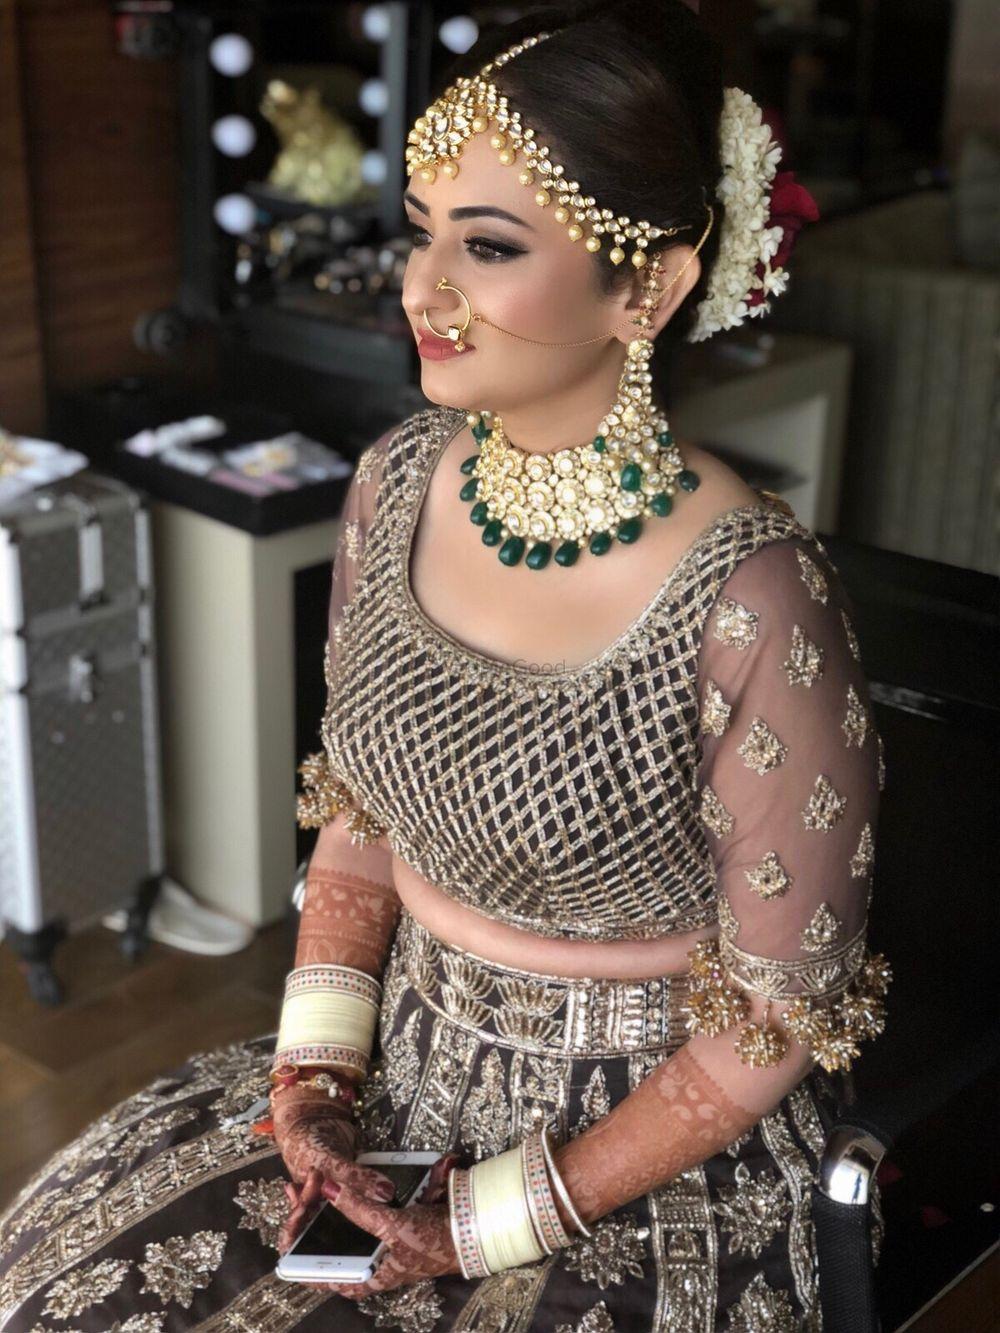 Photo From Tina: A Manish Malhotra bride - By Makeup By Nav Brar